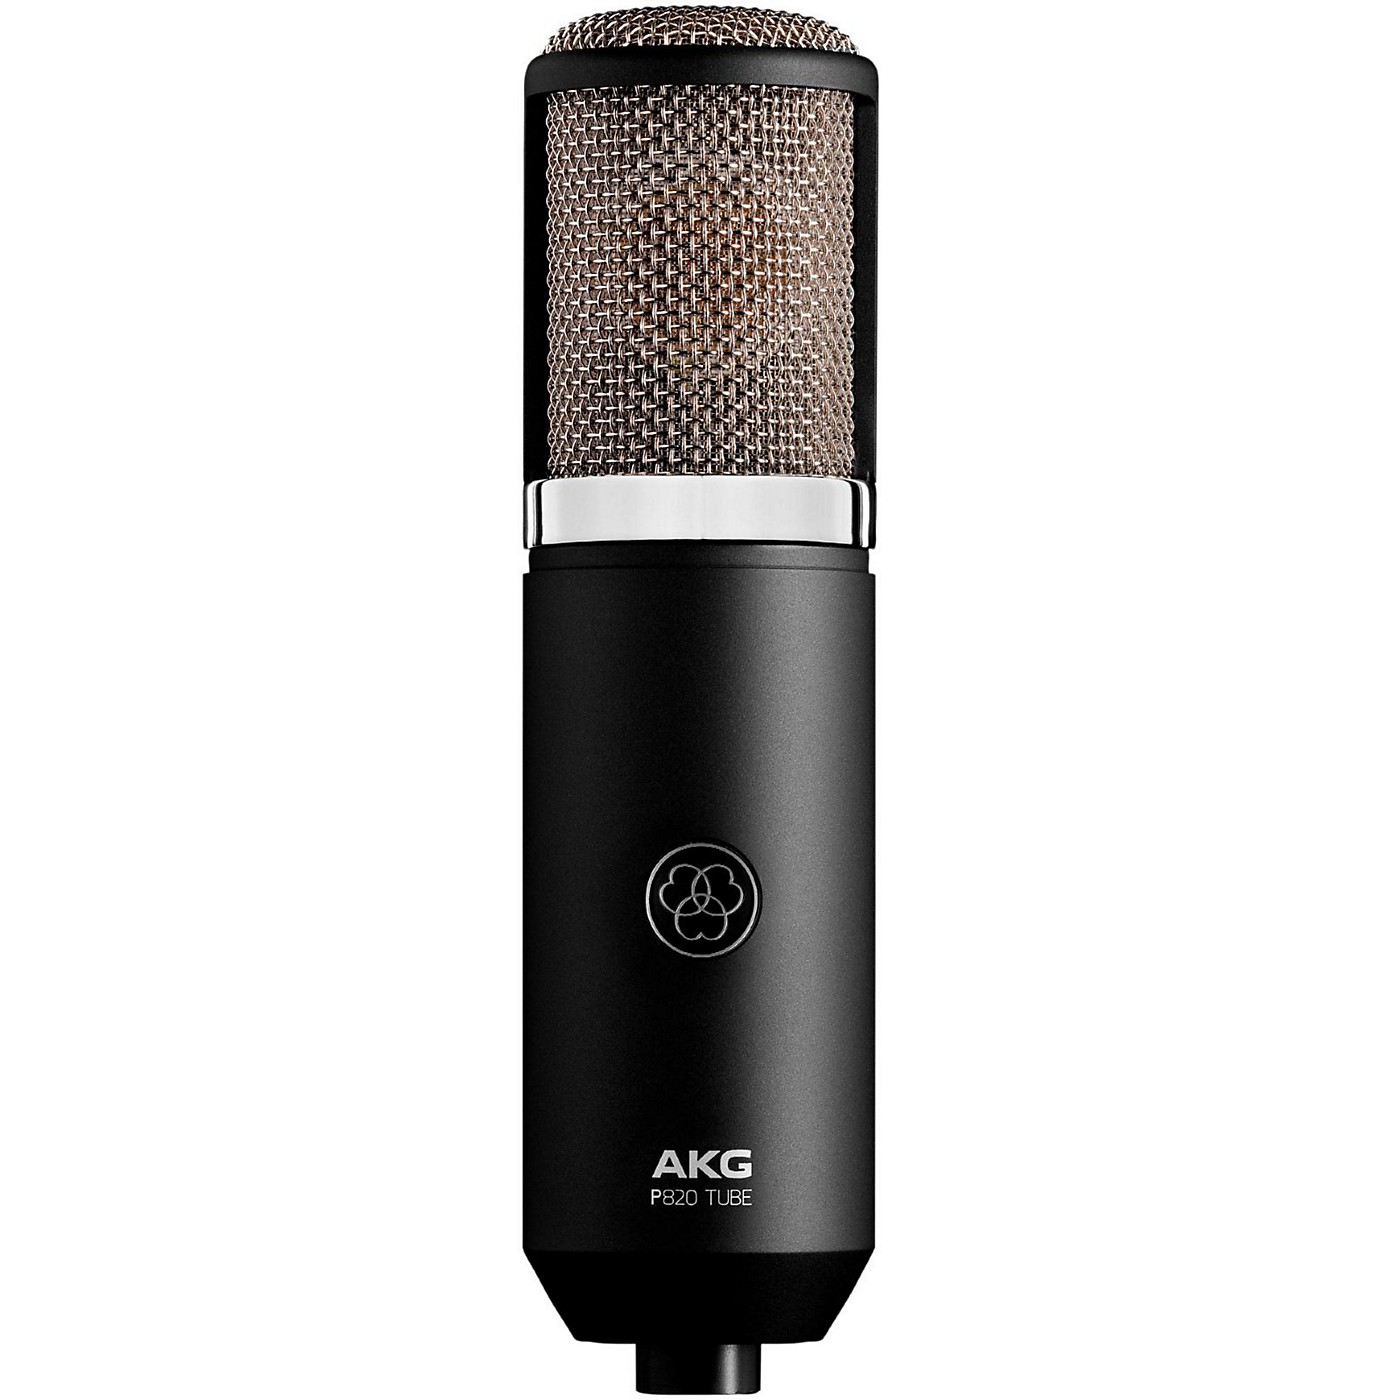 AKG P820 Project Studio Tube Microphone thumbnail